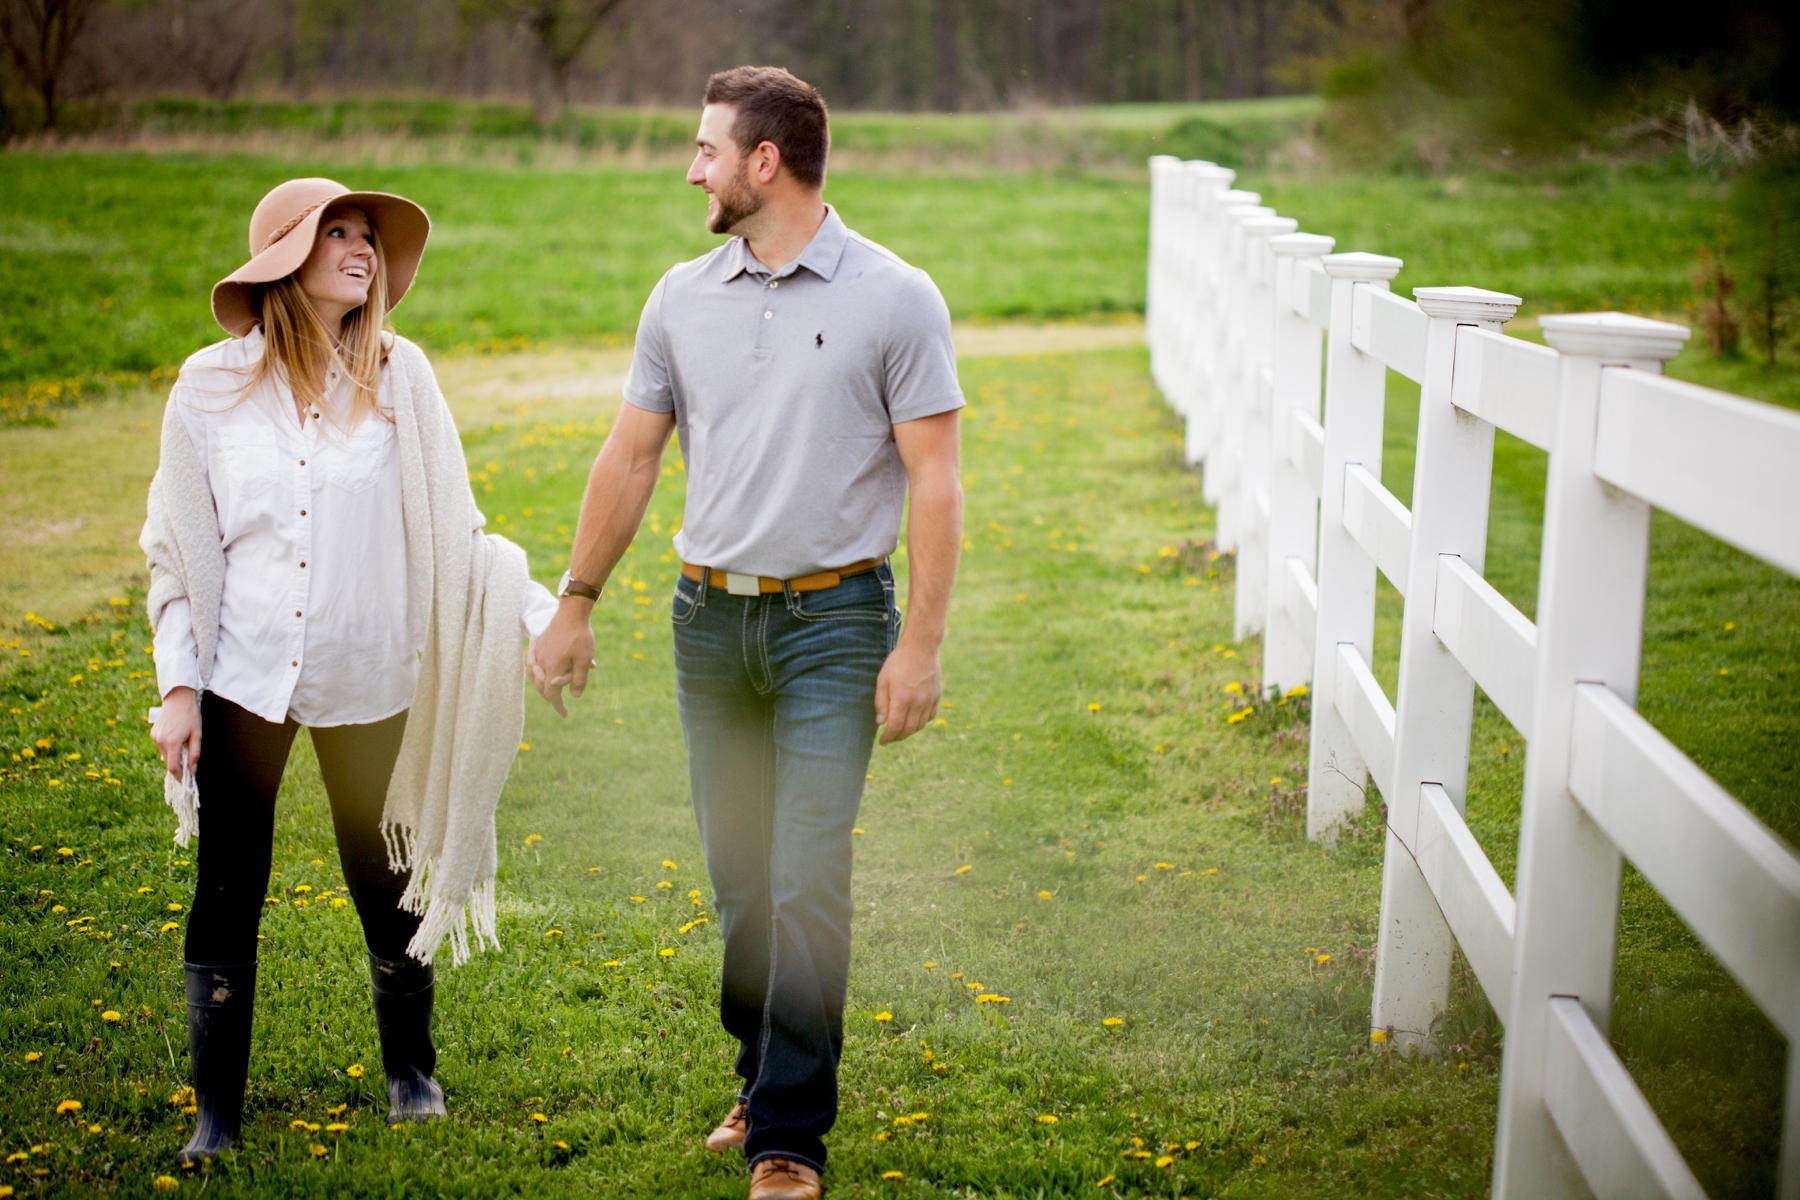 Brandon_Shafer_Photography_Shane_Ashley_Greenhouse_Farm_Michigan_Engagement_0031.jpg